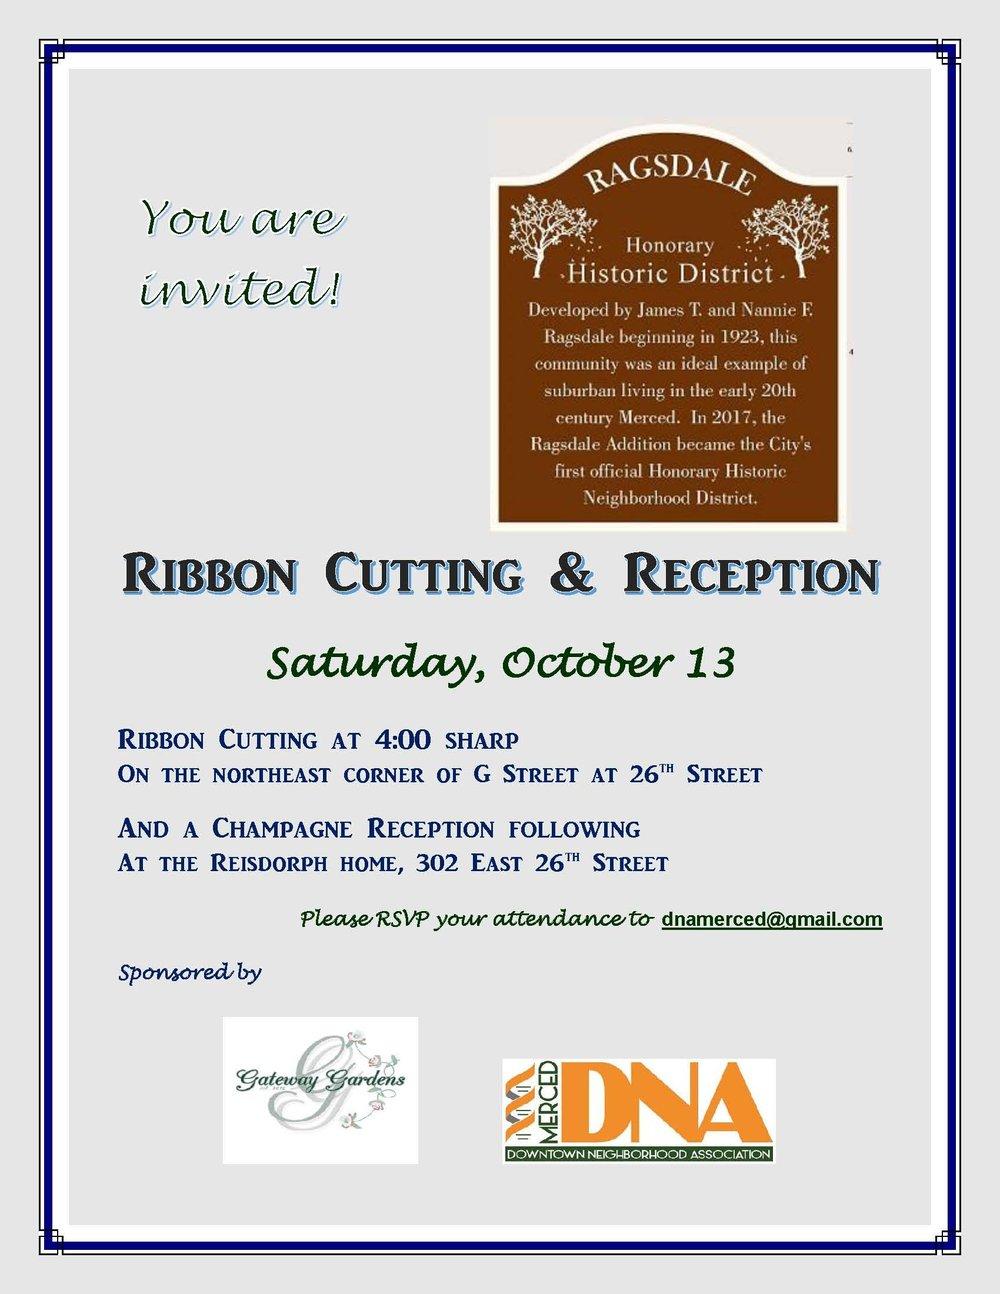 Ragsdale Reception Invitation.jpg